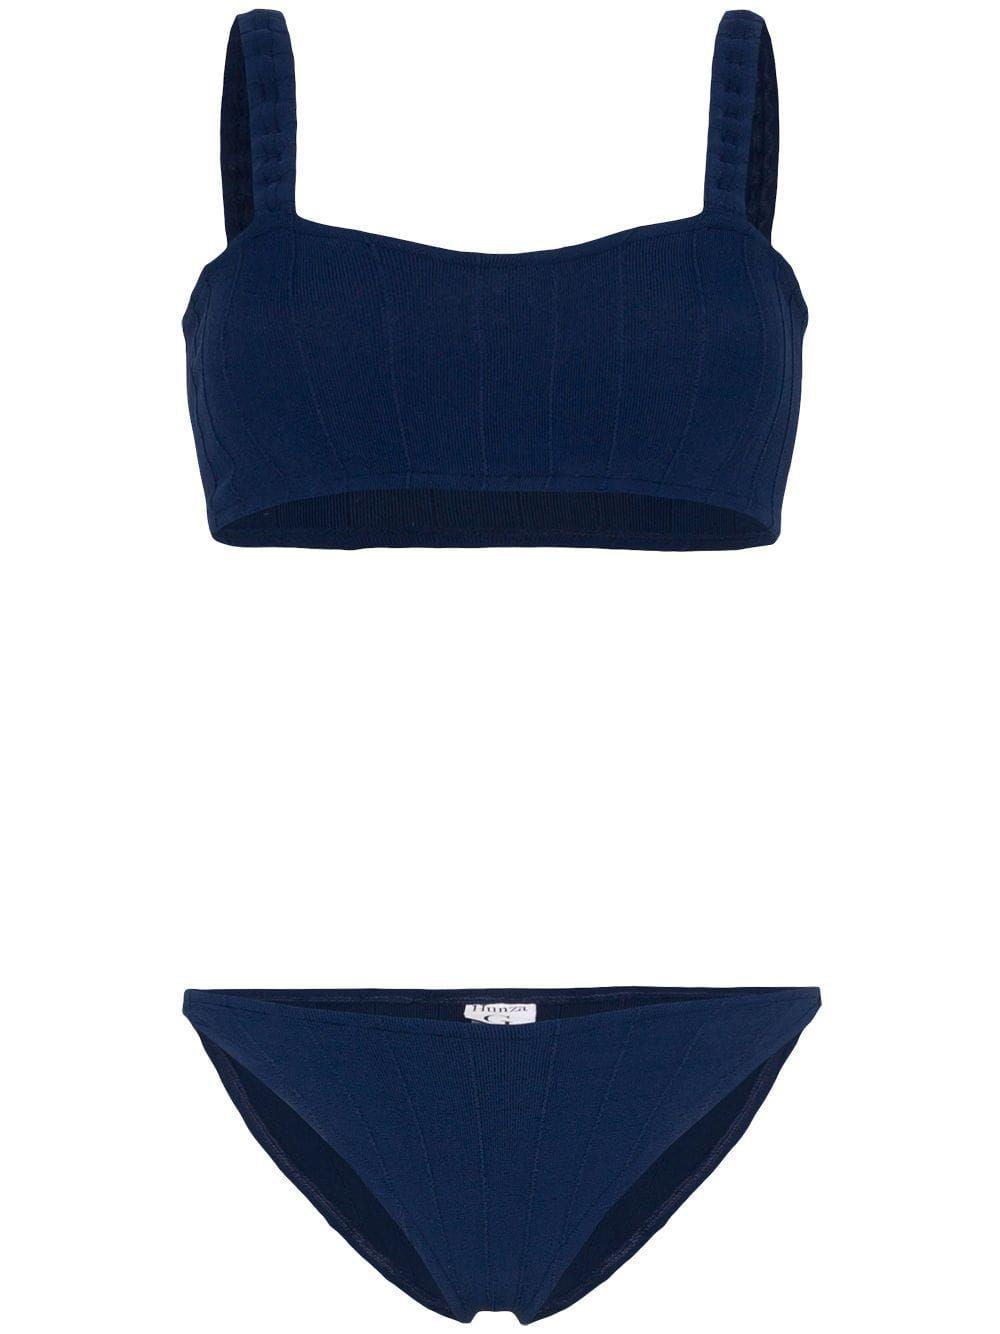 88793cd45e Hunza G Aneski bikini - Blue in 2019 | Products | Hunza g, Bikinis ...